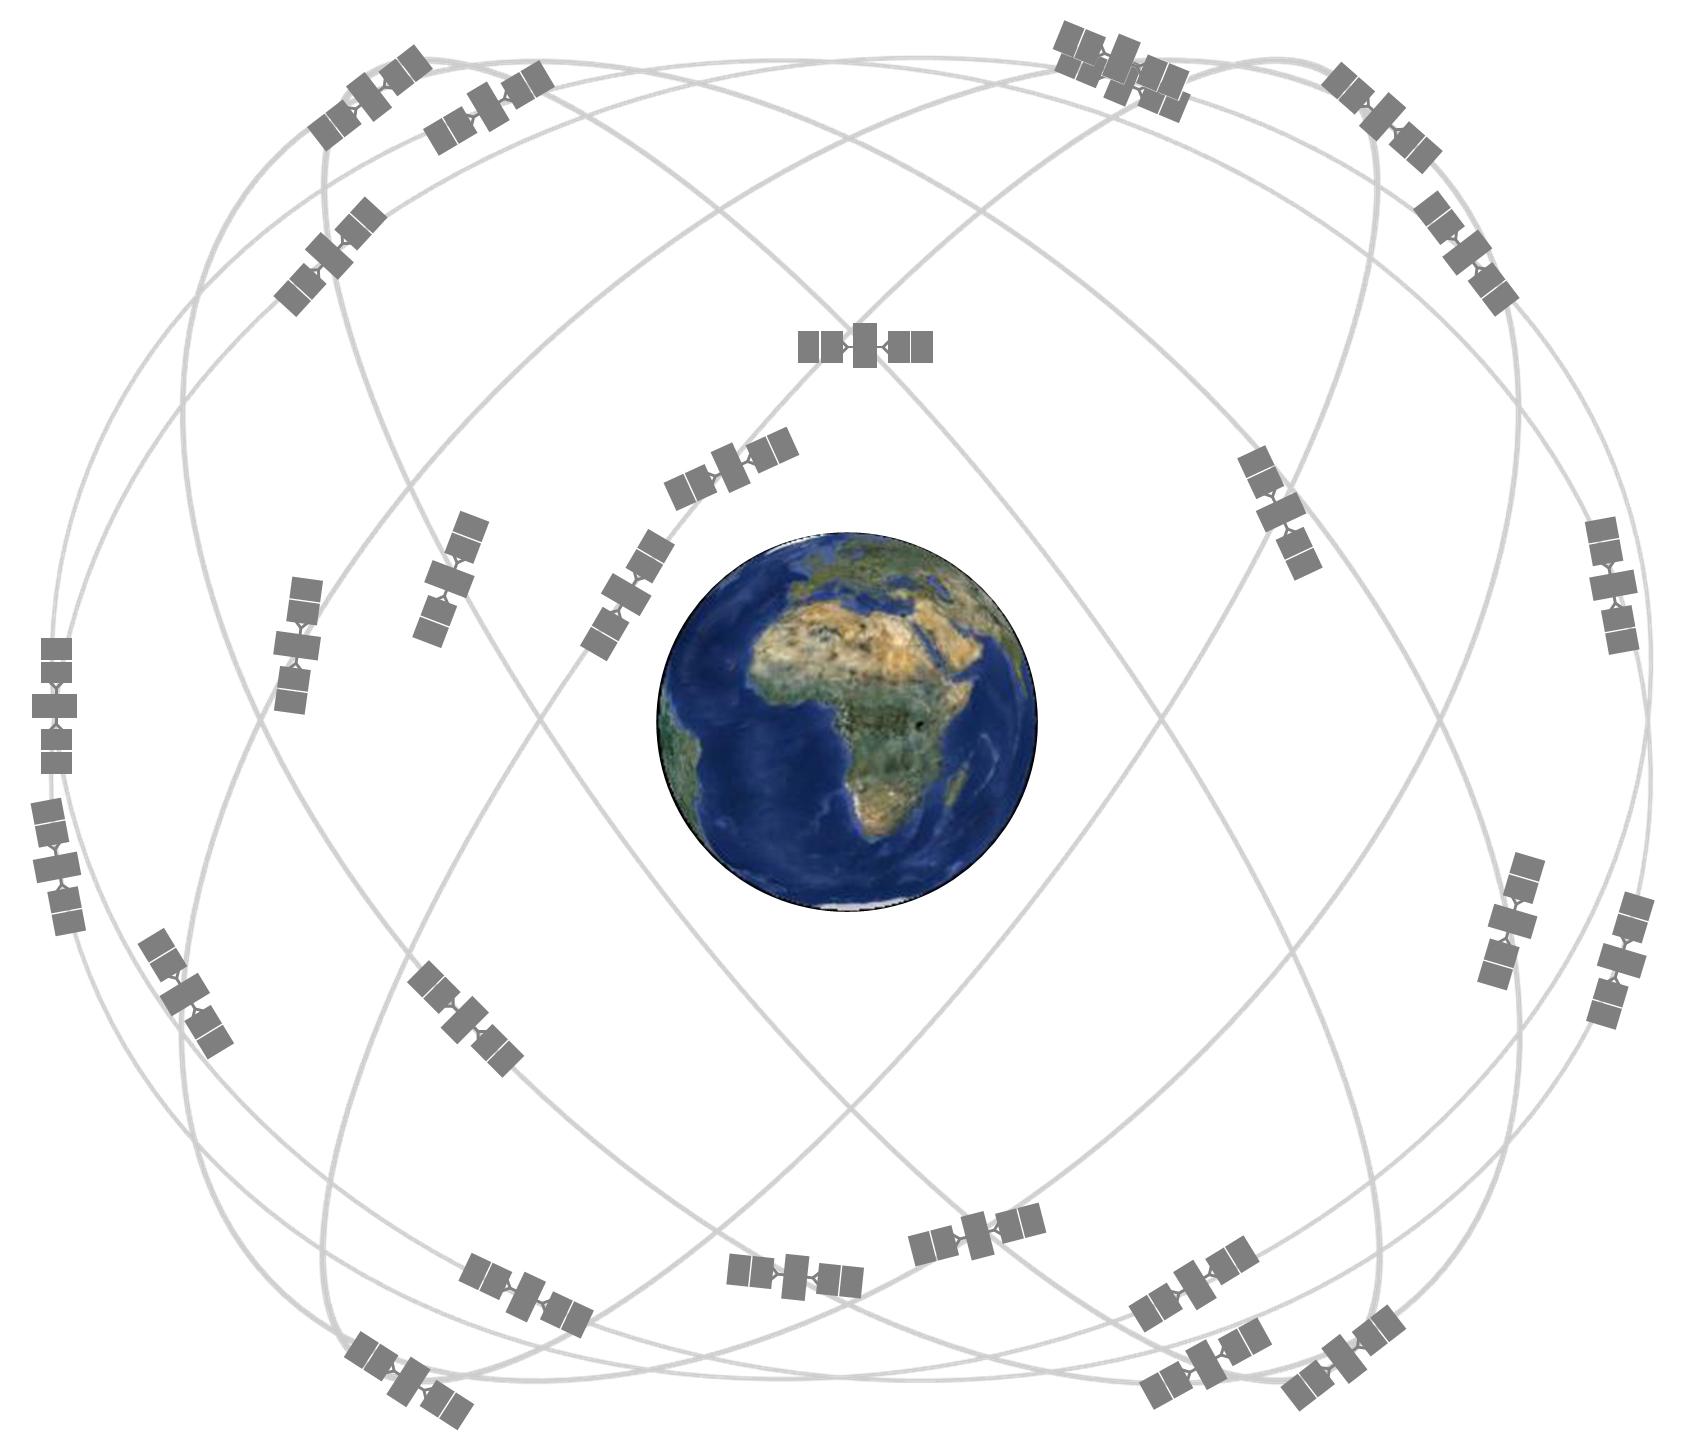 img1-gps-constellation